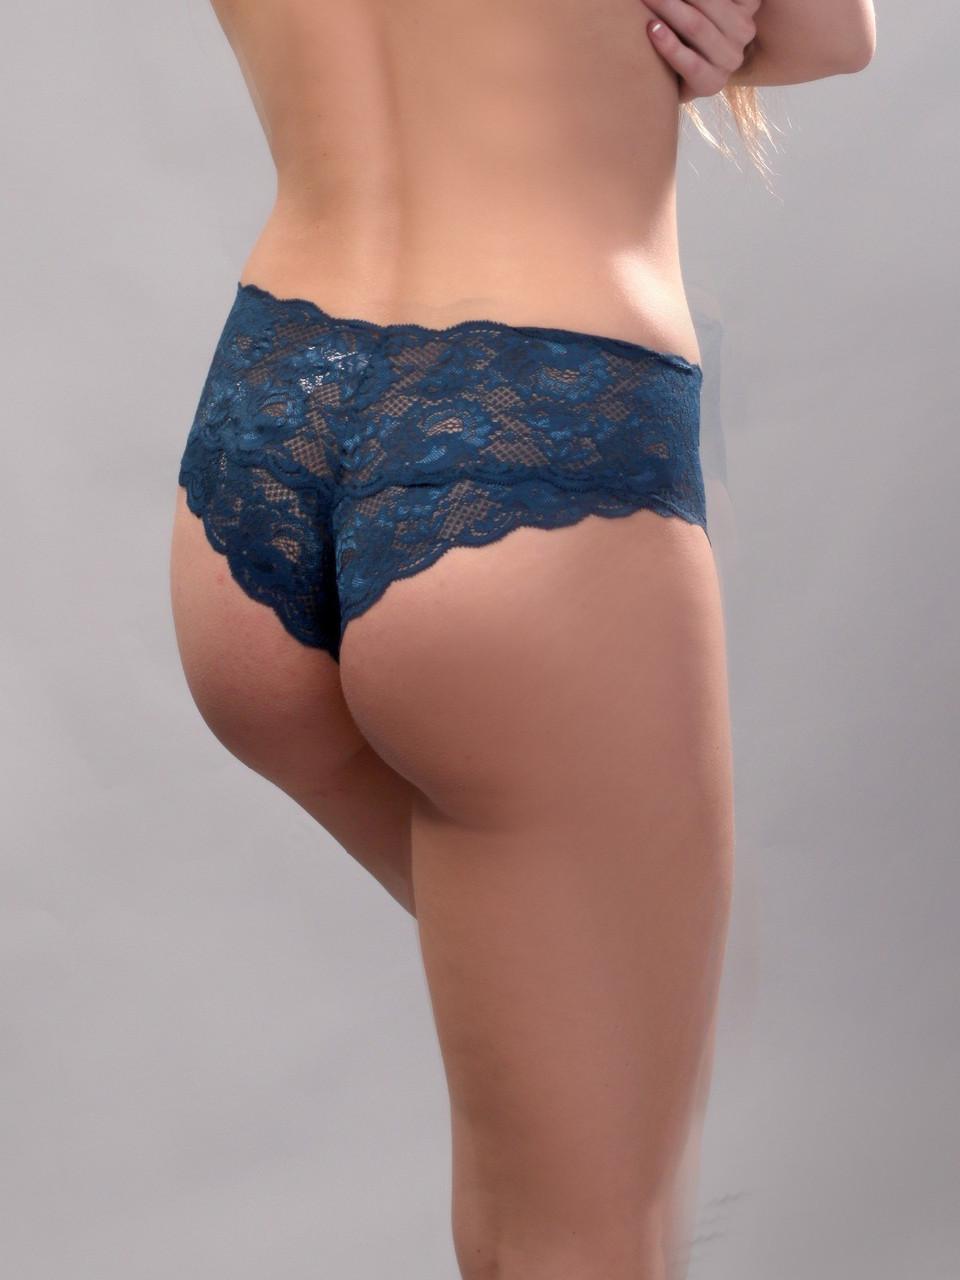 Трусики женские Acousma P6430H, цвет Темно-Синий, размер M